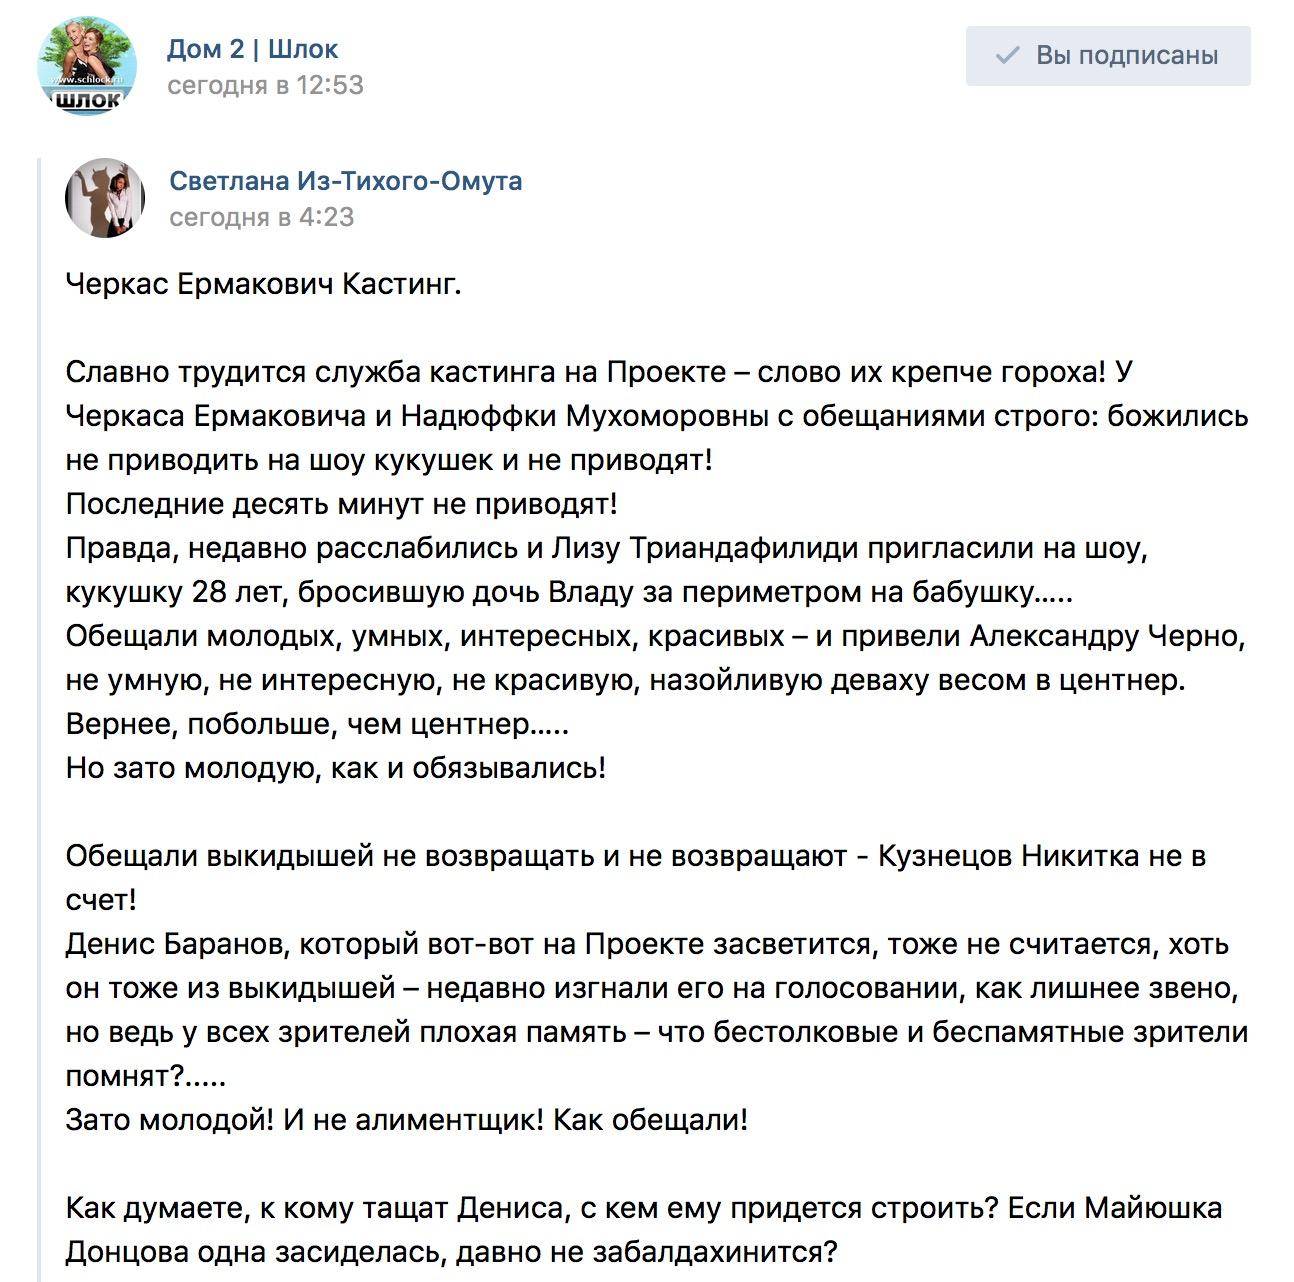 Черкас Ермакович Кастинг